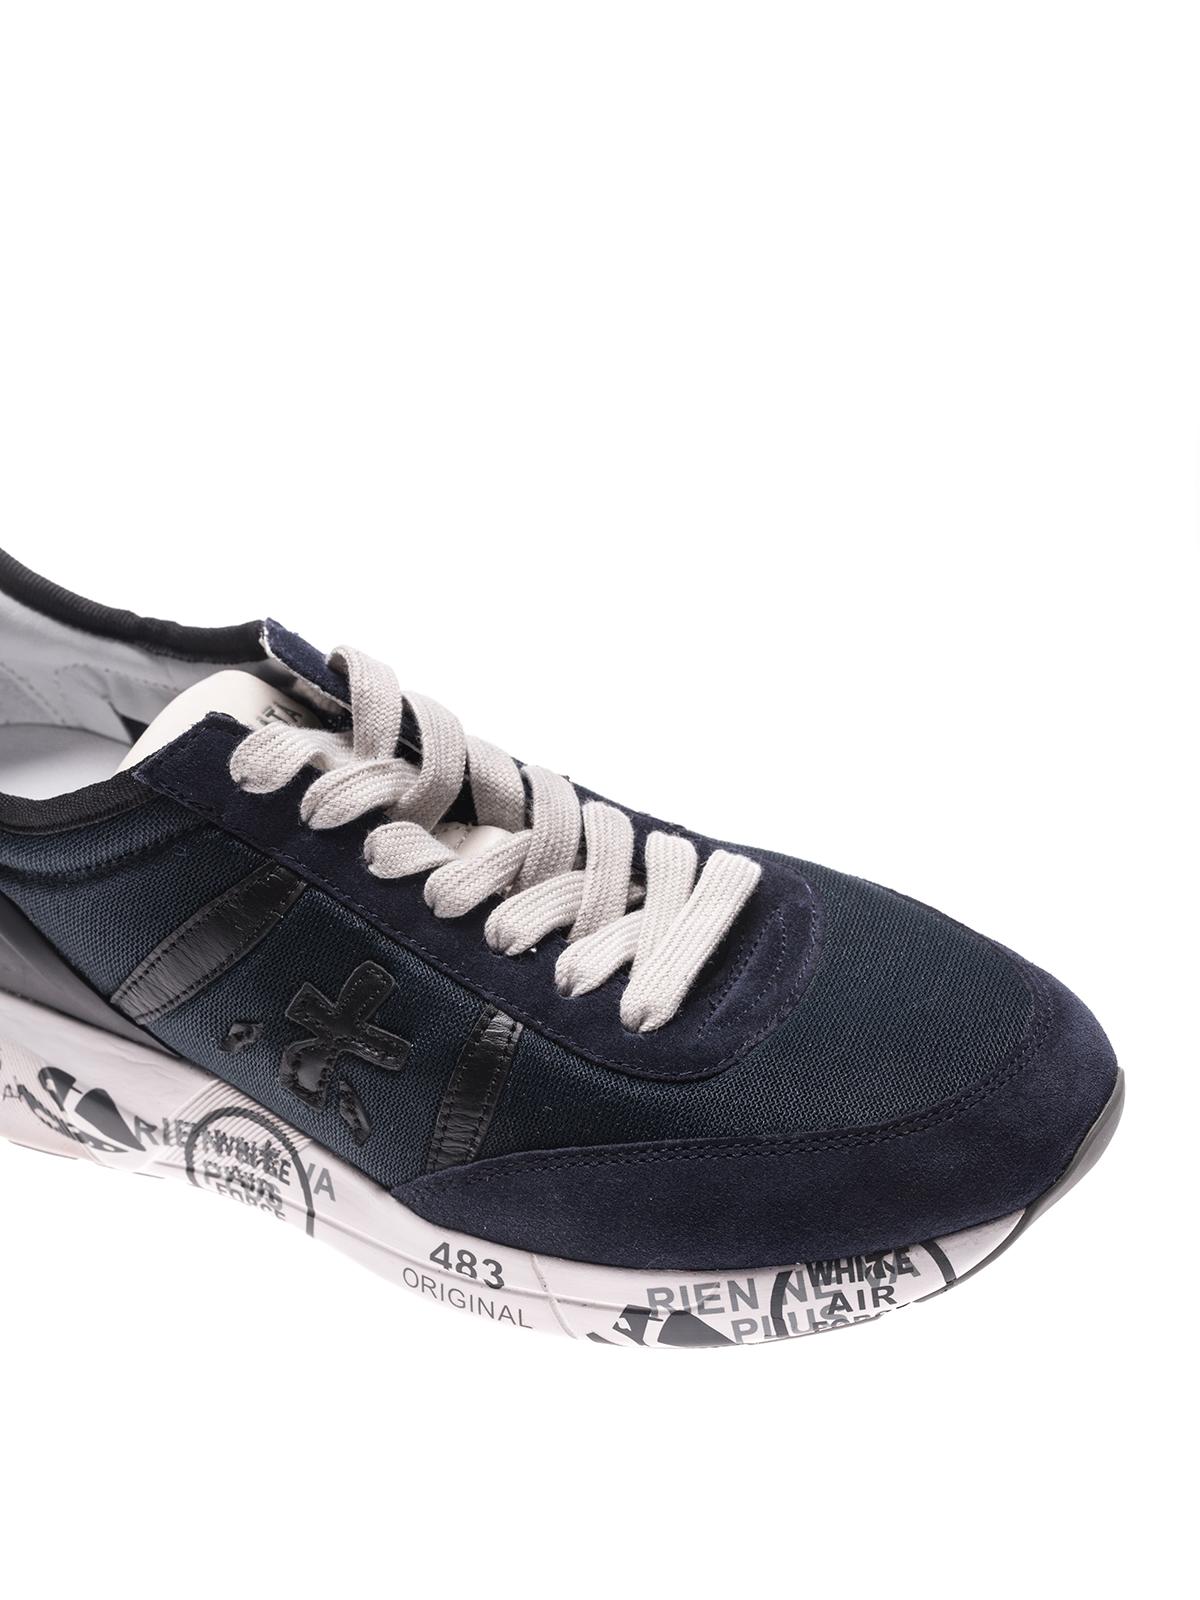 Blue Hanzo sneakers Premiata 8c8t8nSg